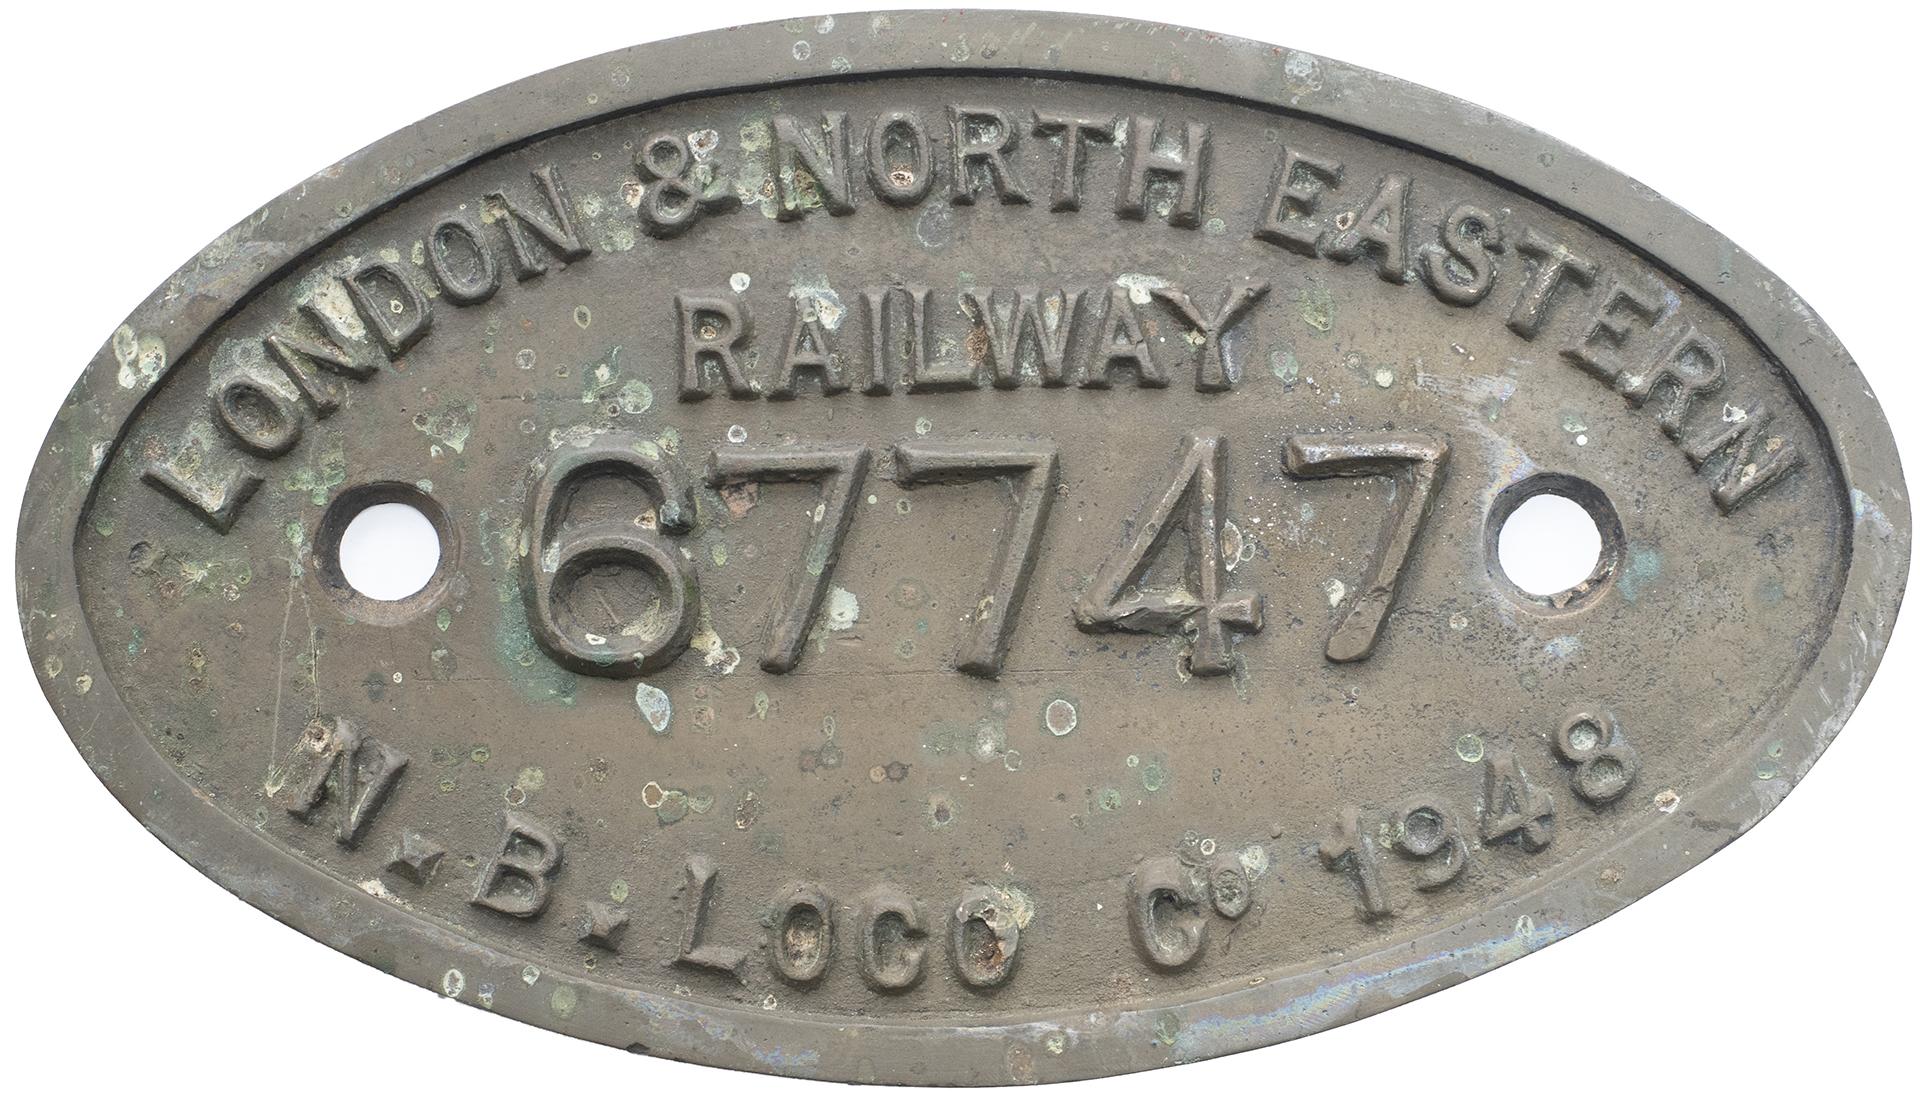 Worksplate 9x5 LONDON & NORTH EASTERN RAILWAY N.B.LOCO CO 1948 67747 ex Thompson L1 2-6-4T.